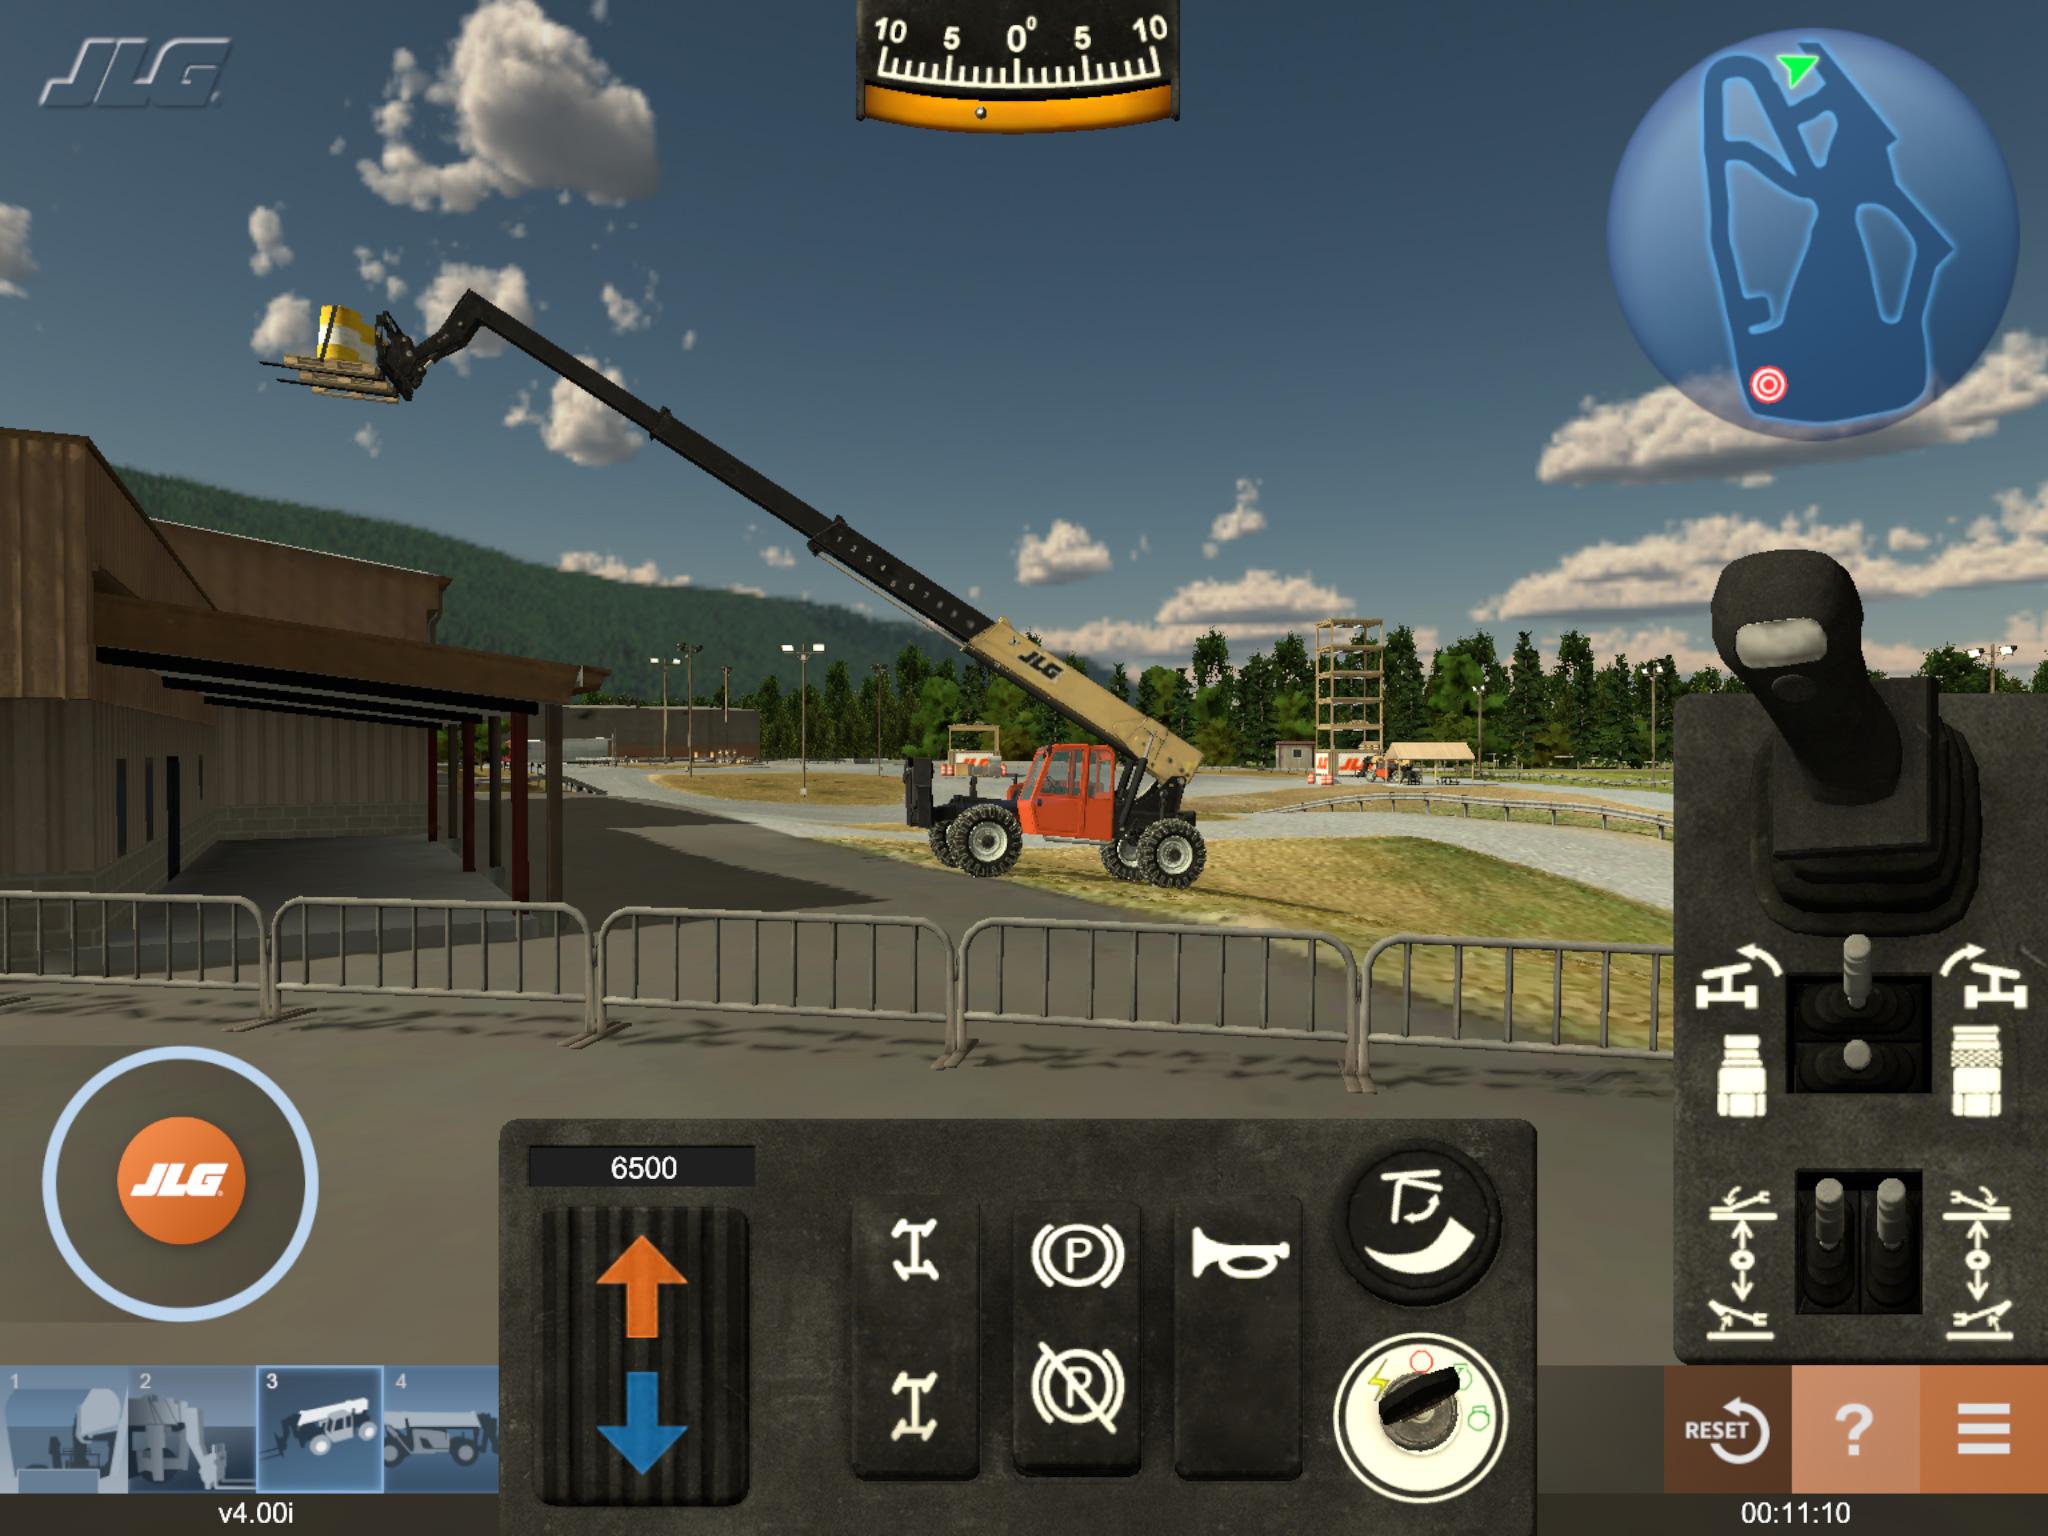 JLG Telehandler Training Simulator